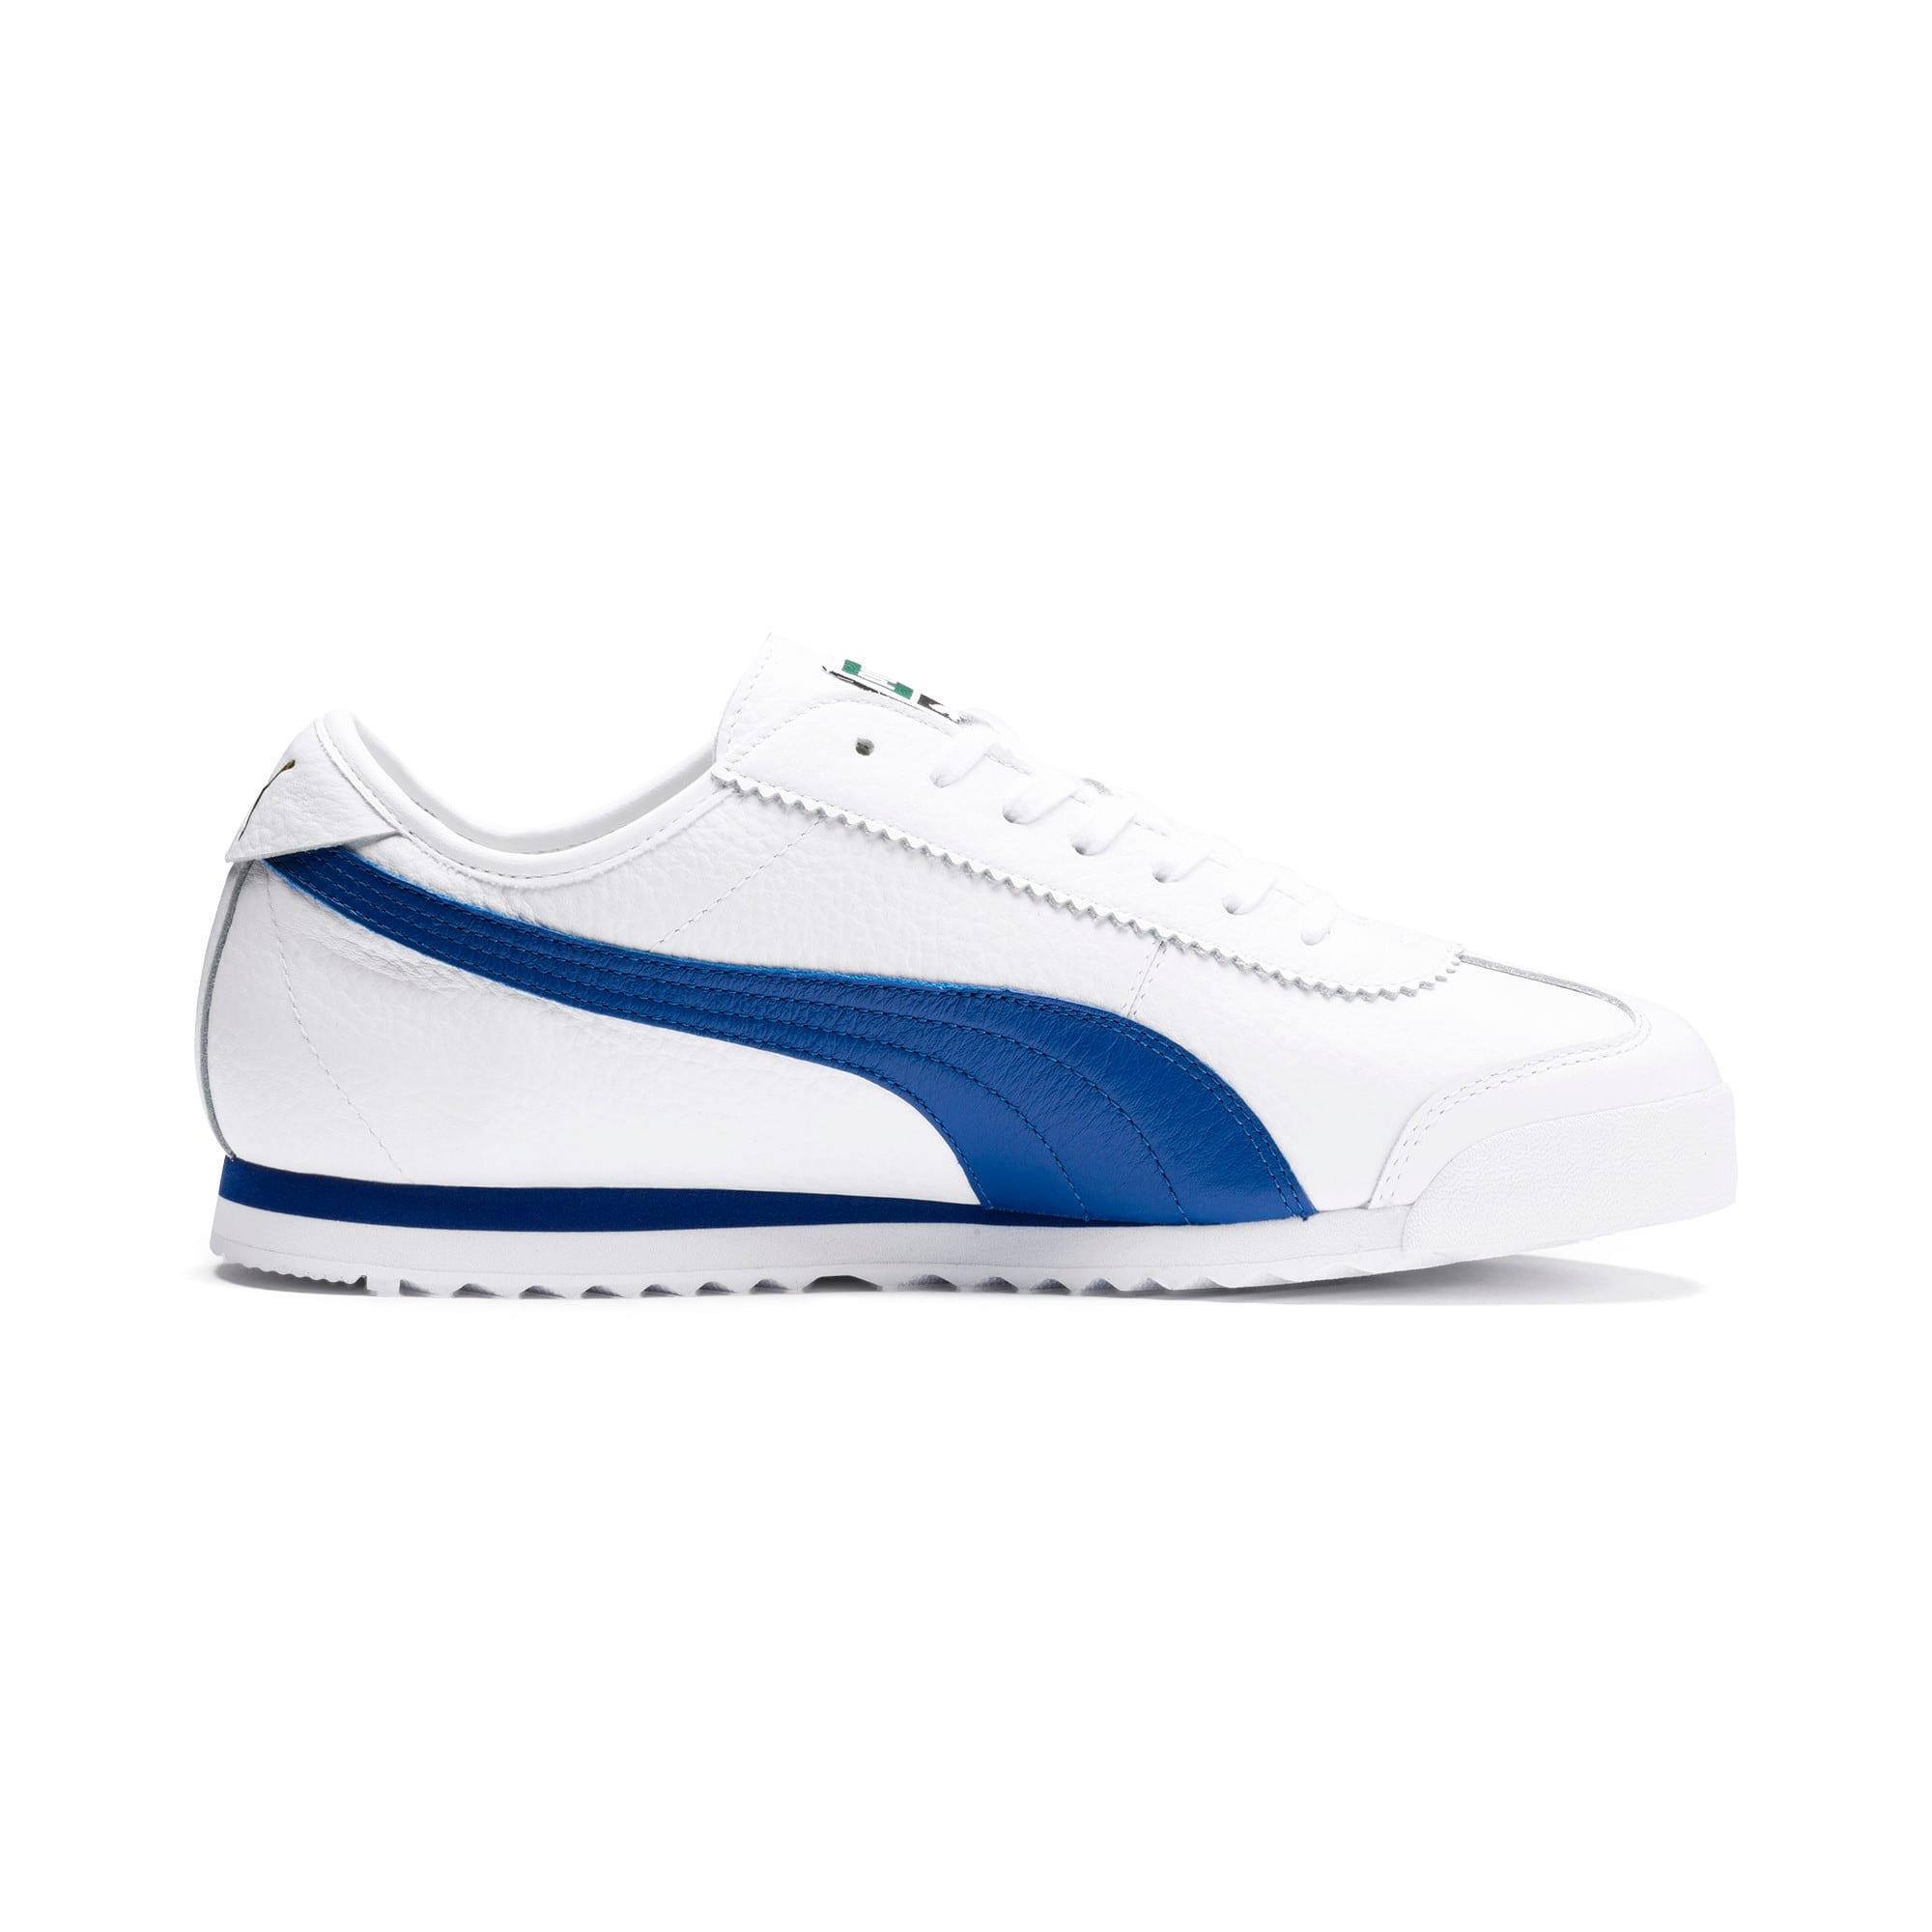 Thumbnail 6 of Roma '68 Vintage Sneakers, Puma White-Galaxy Blue, medium